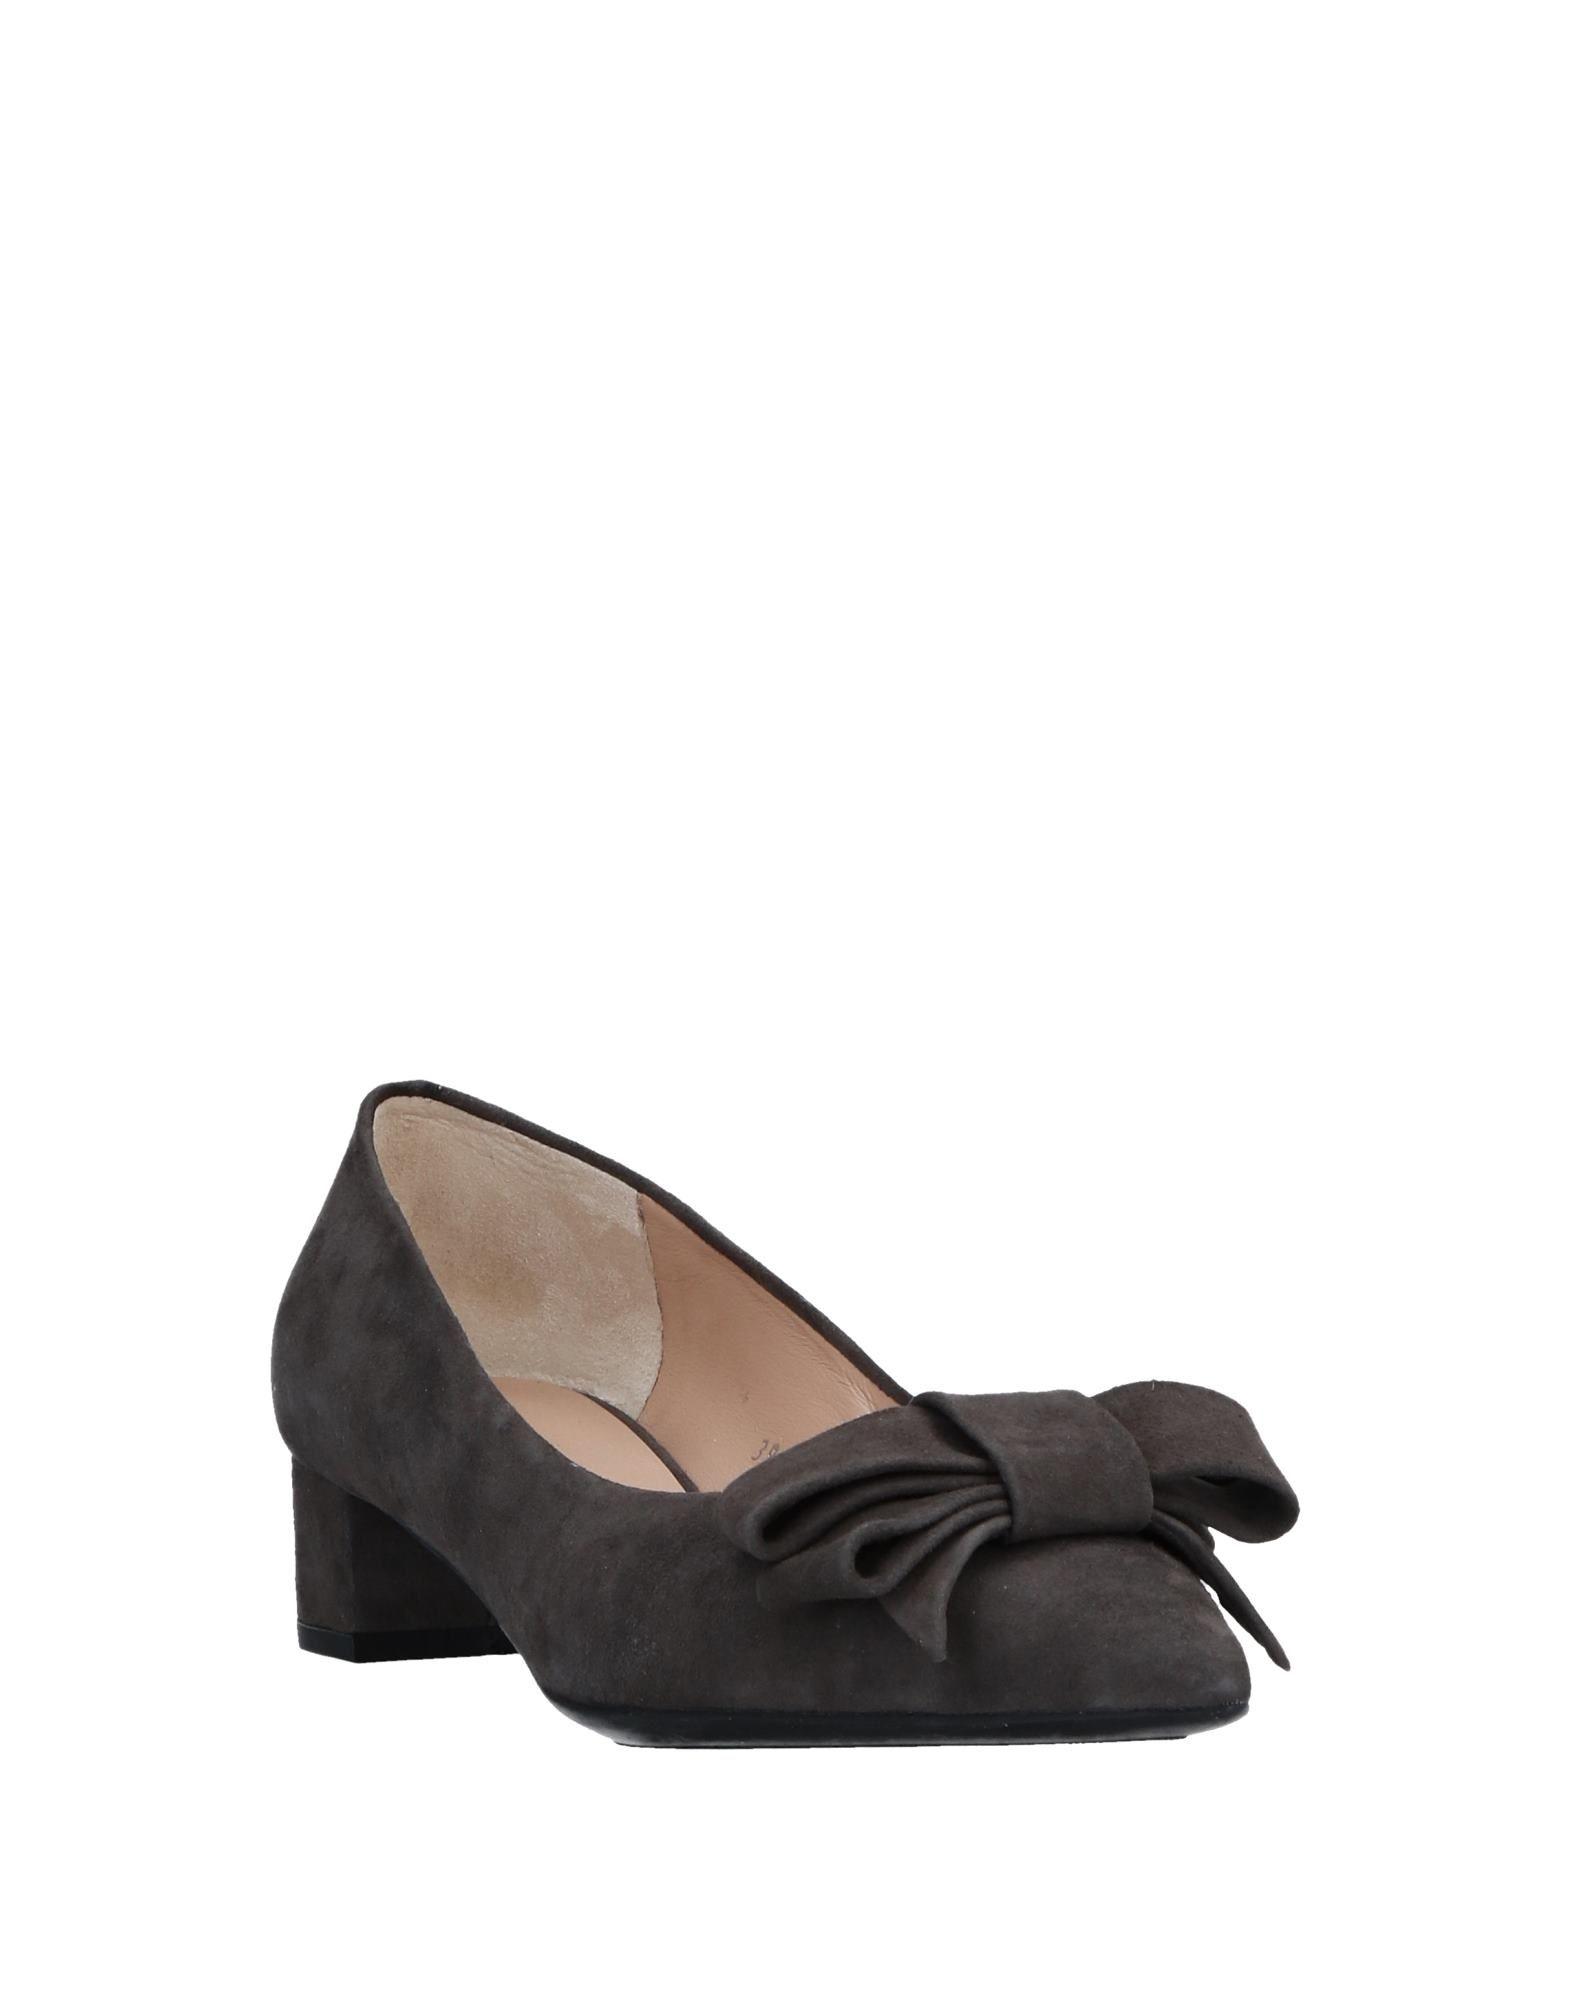 C.Waldorf Pumps Damen  11534176BK Schuhe Gute Qualität beliebte Schuhe 11534176BK 927933